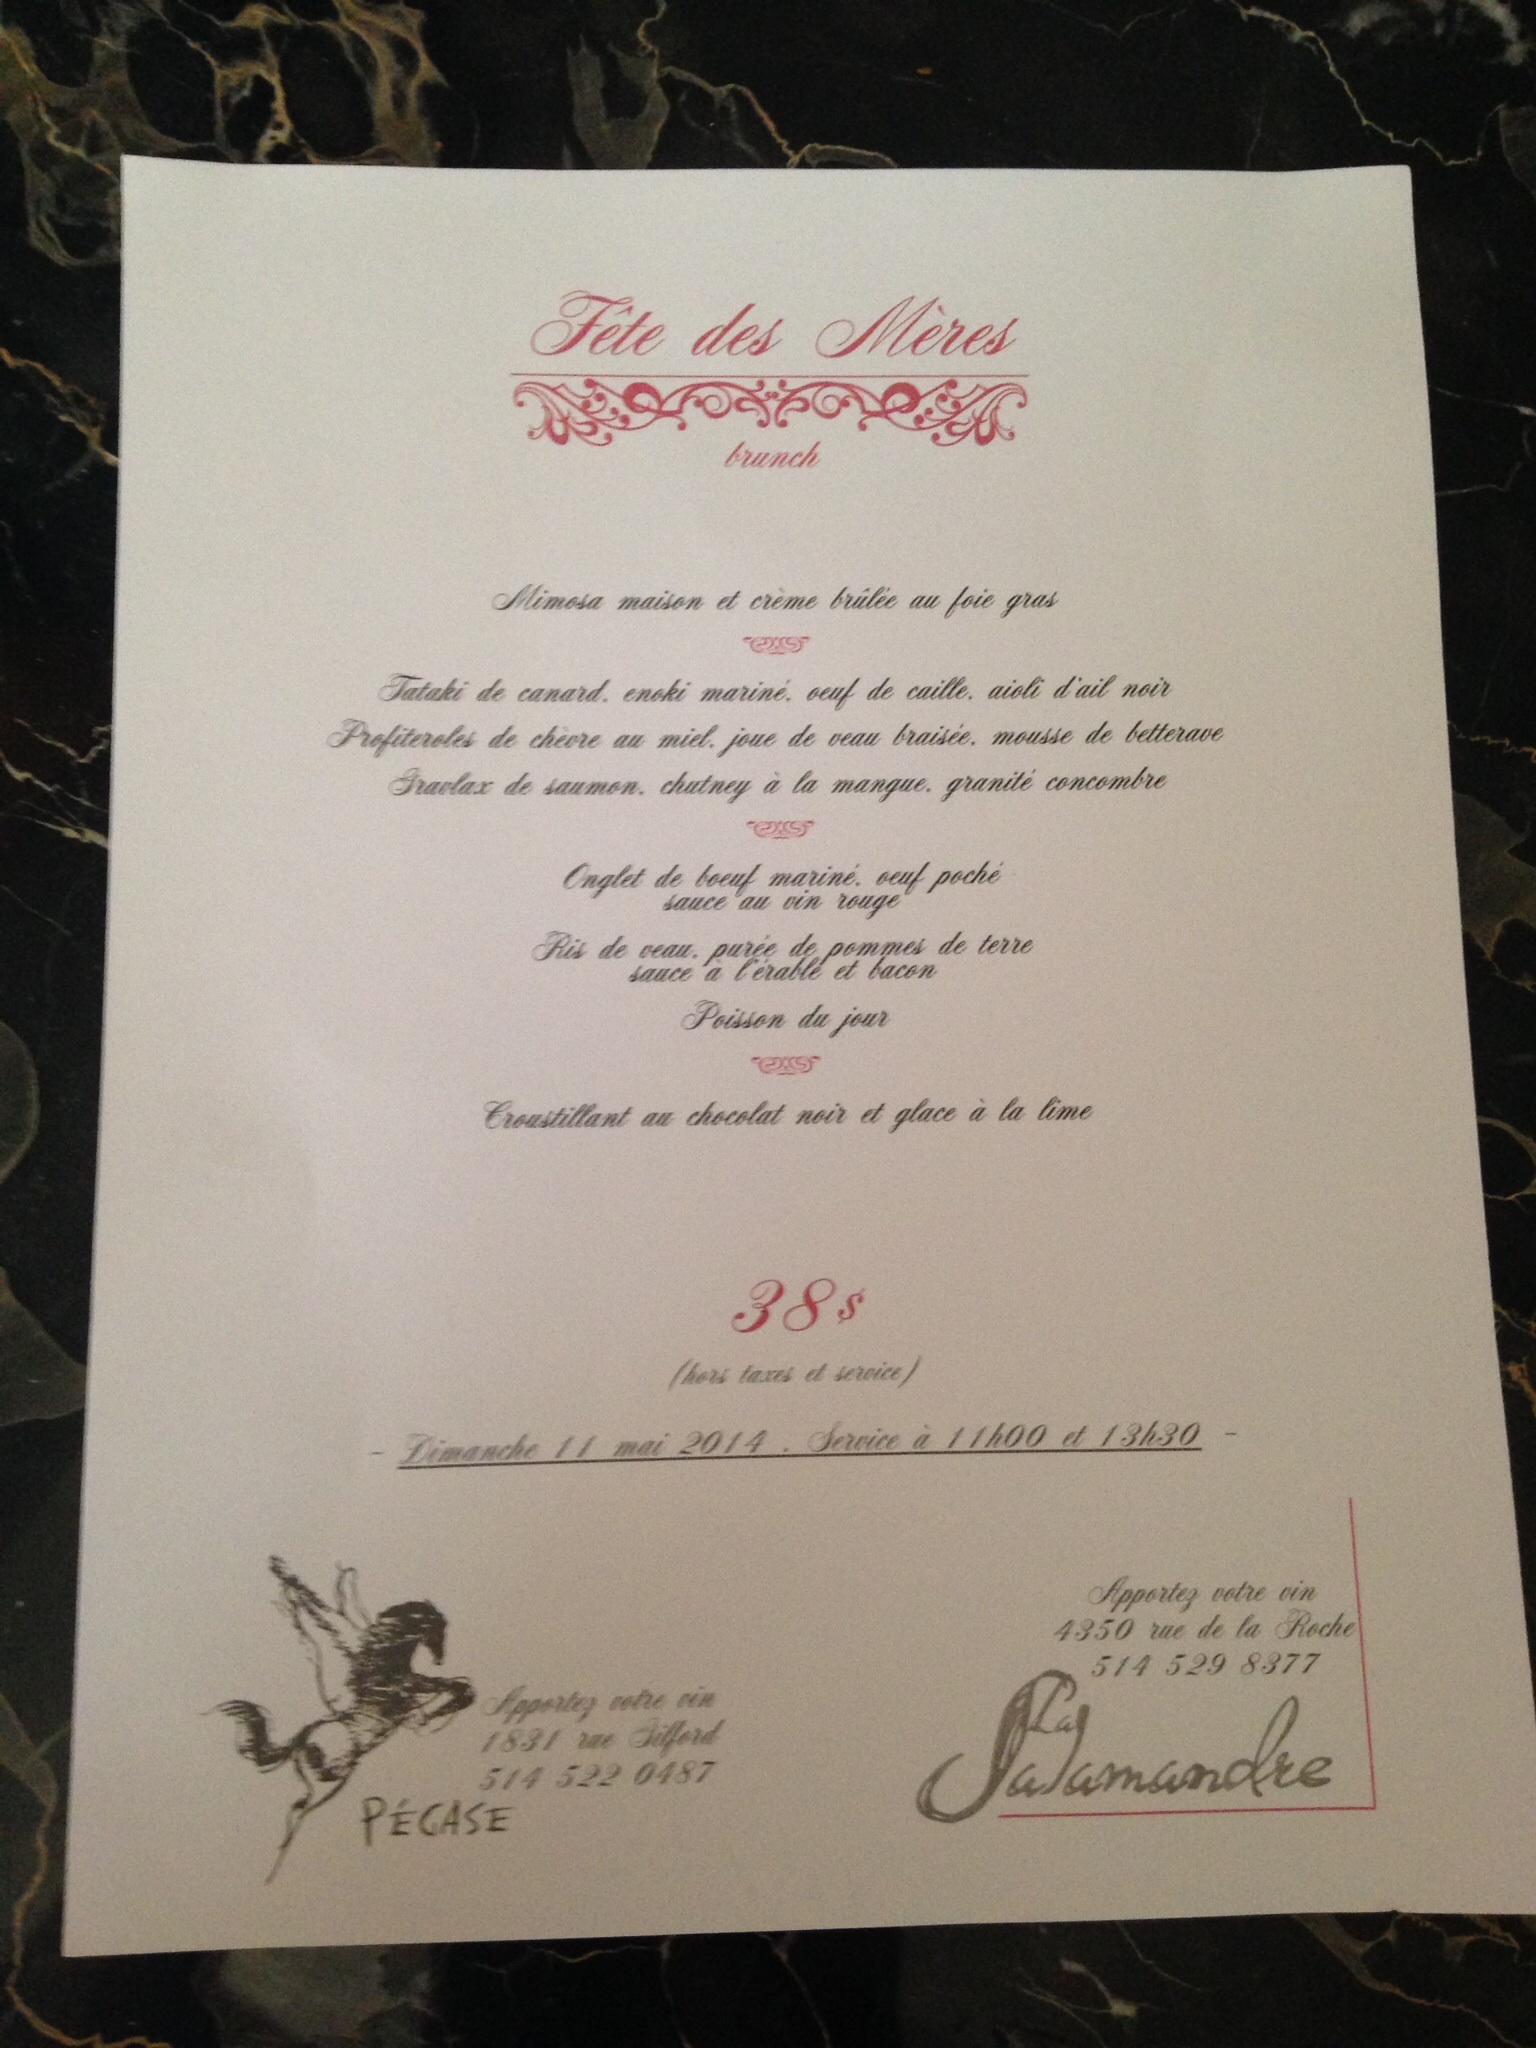 Mother's Day menu at Le Pegase